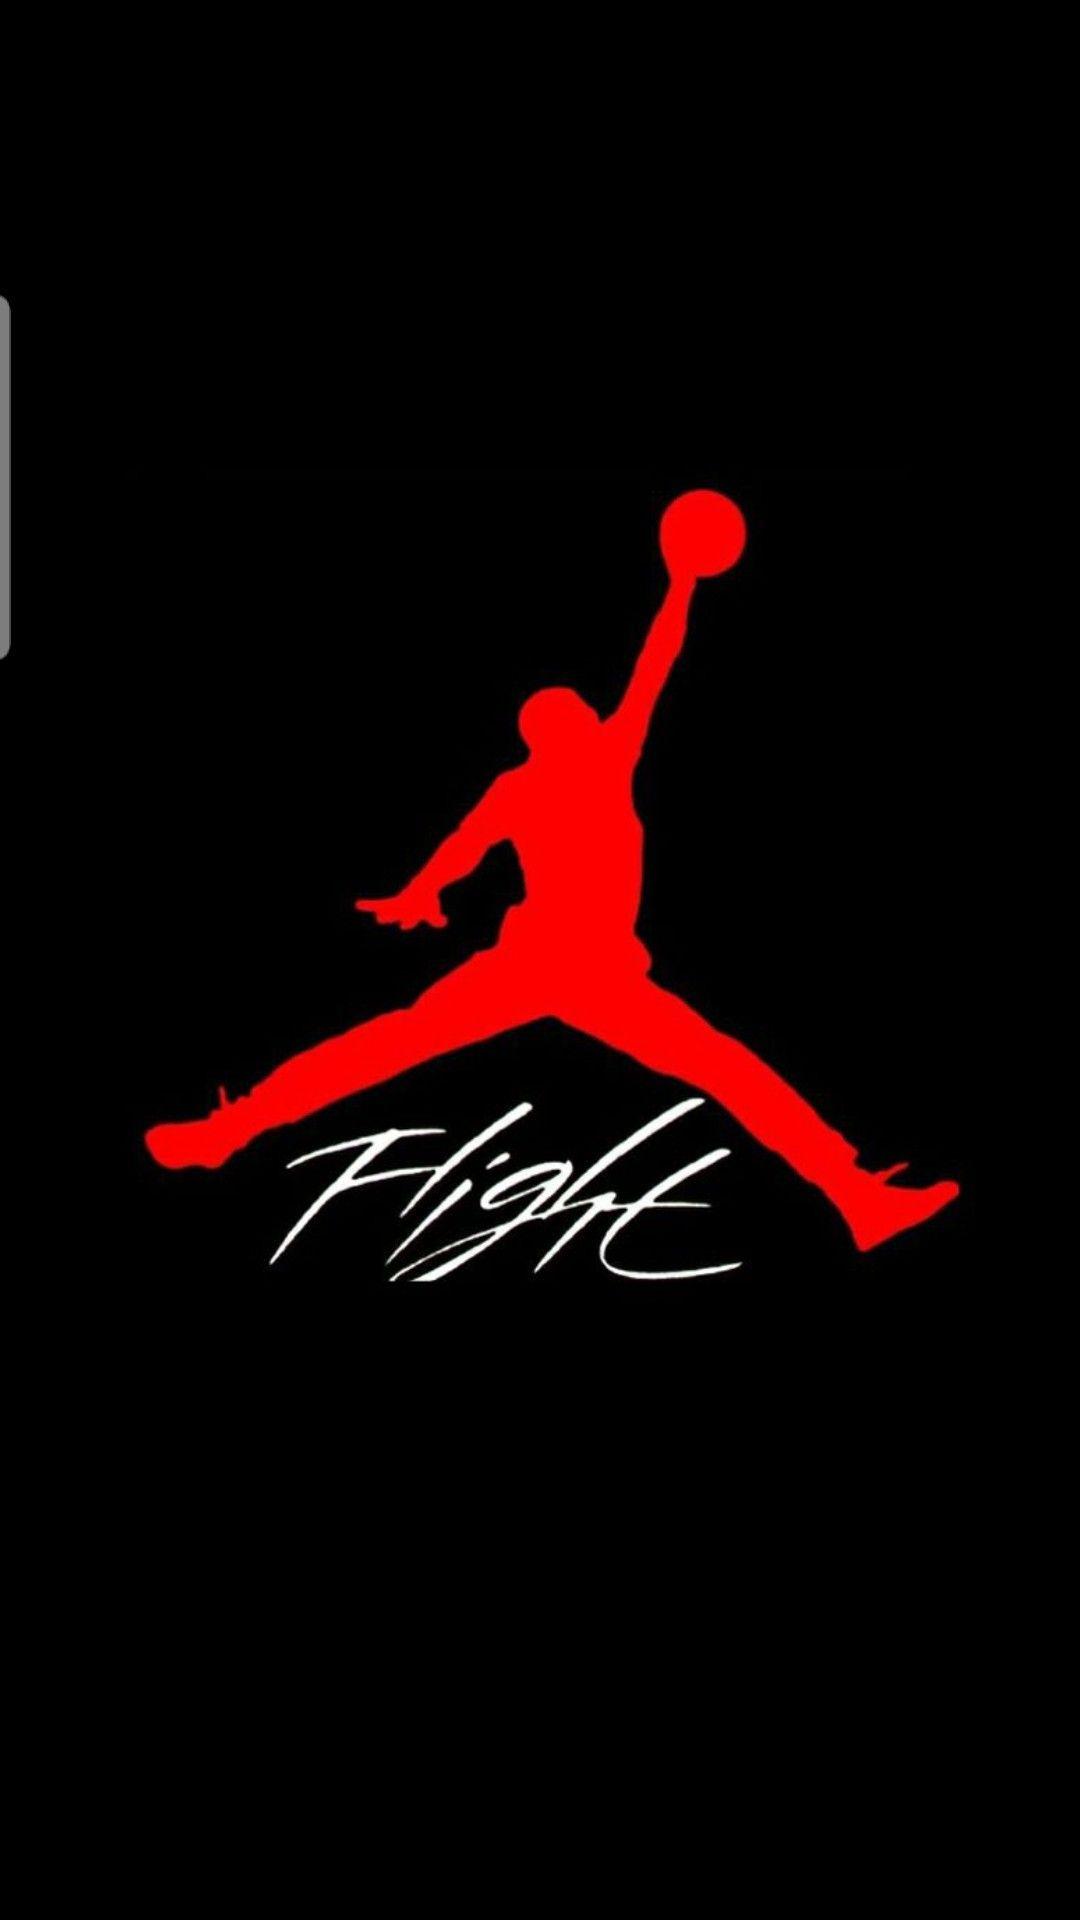 Pin By Archie Douglas On Sportz Wallpaperz Jordan Logo Wallpaper Michael Jordan Art Jordan Background